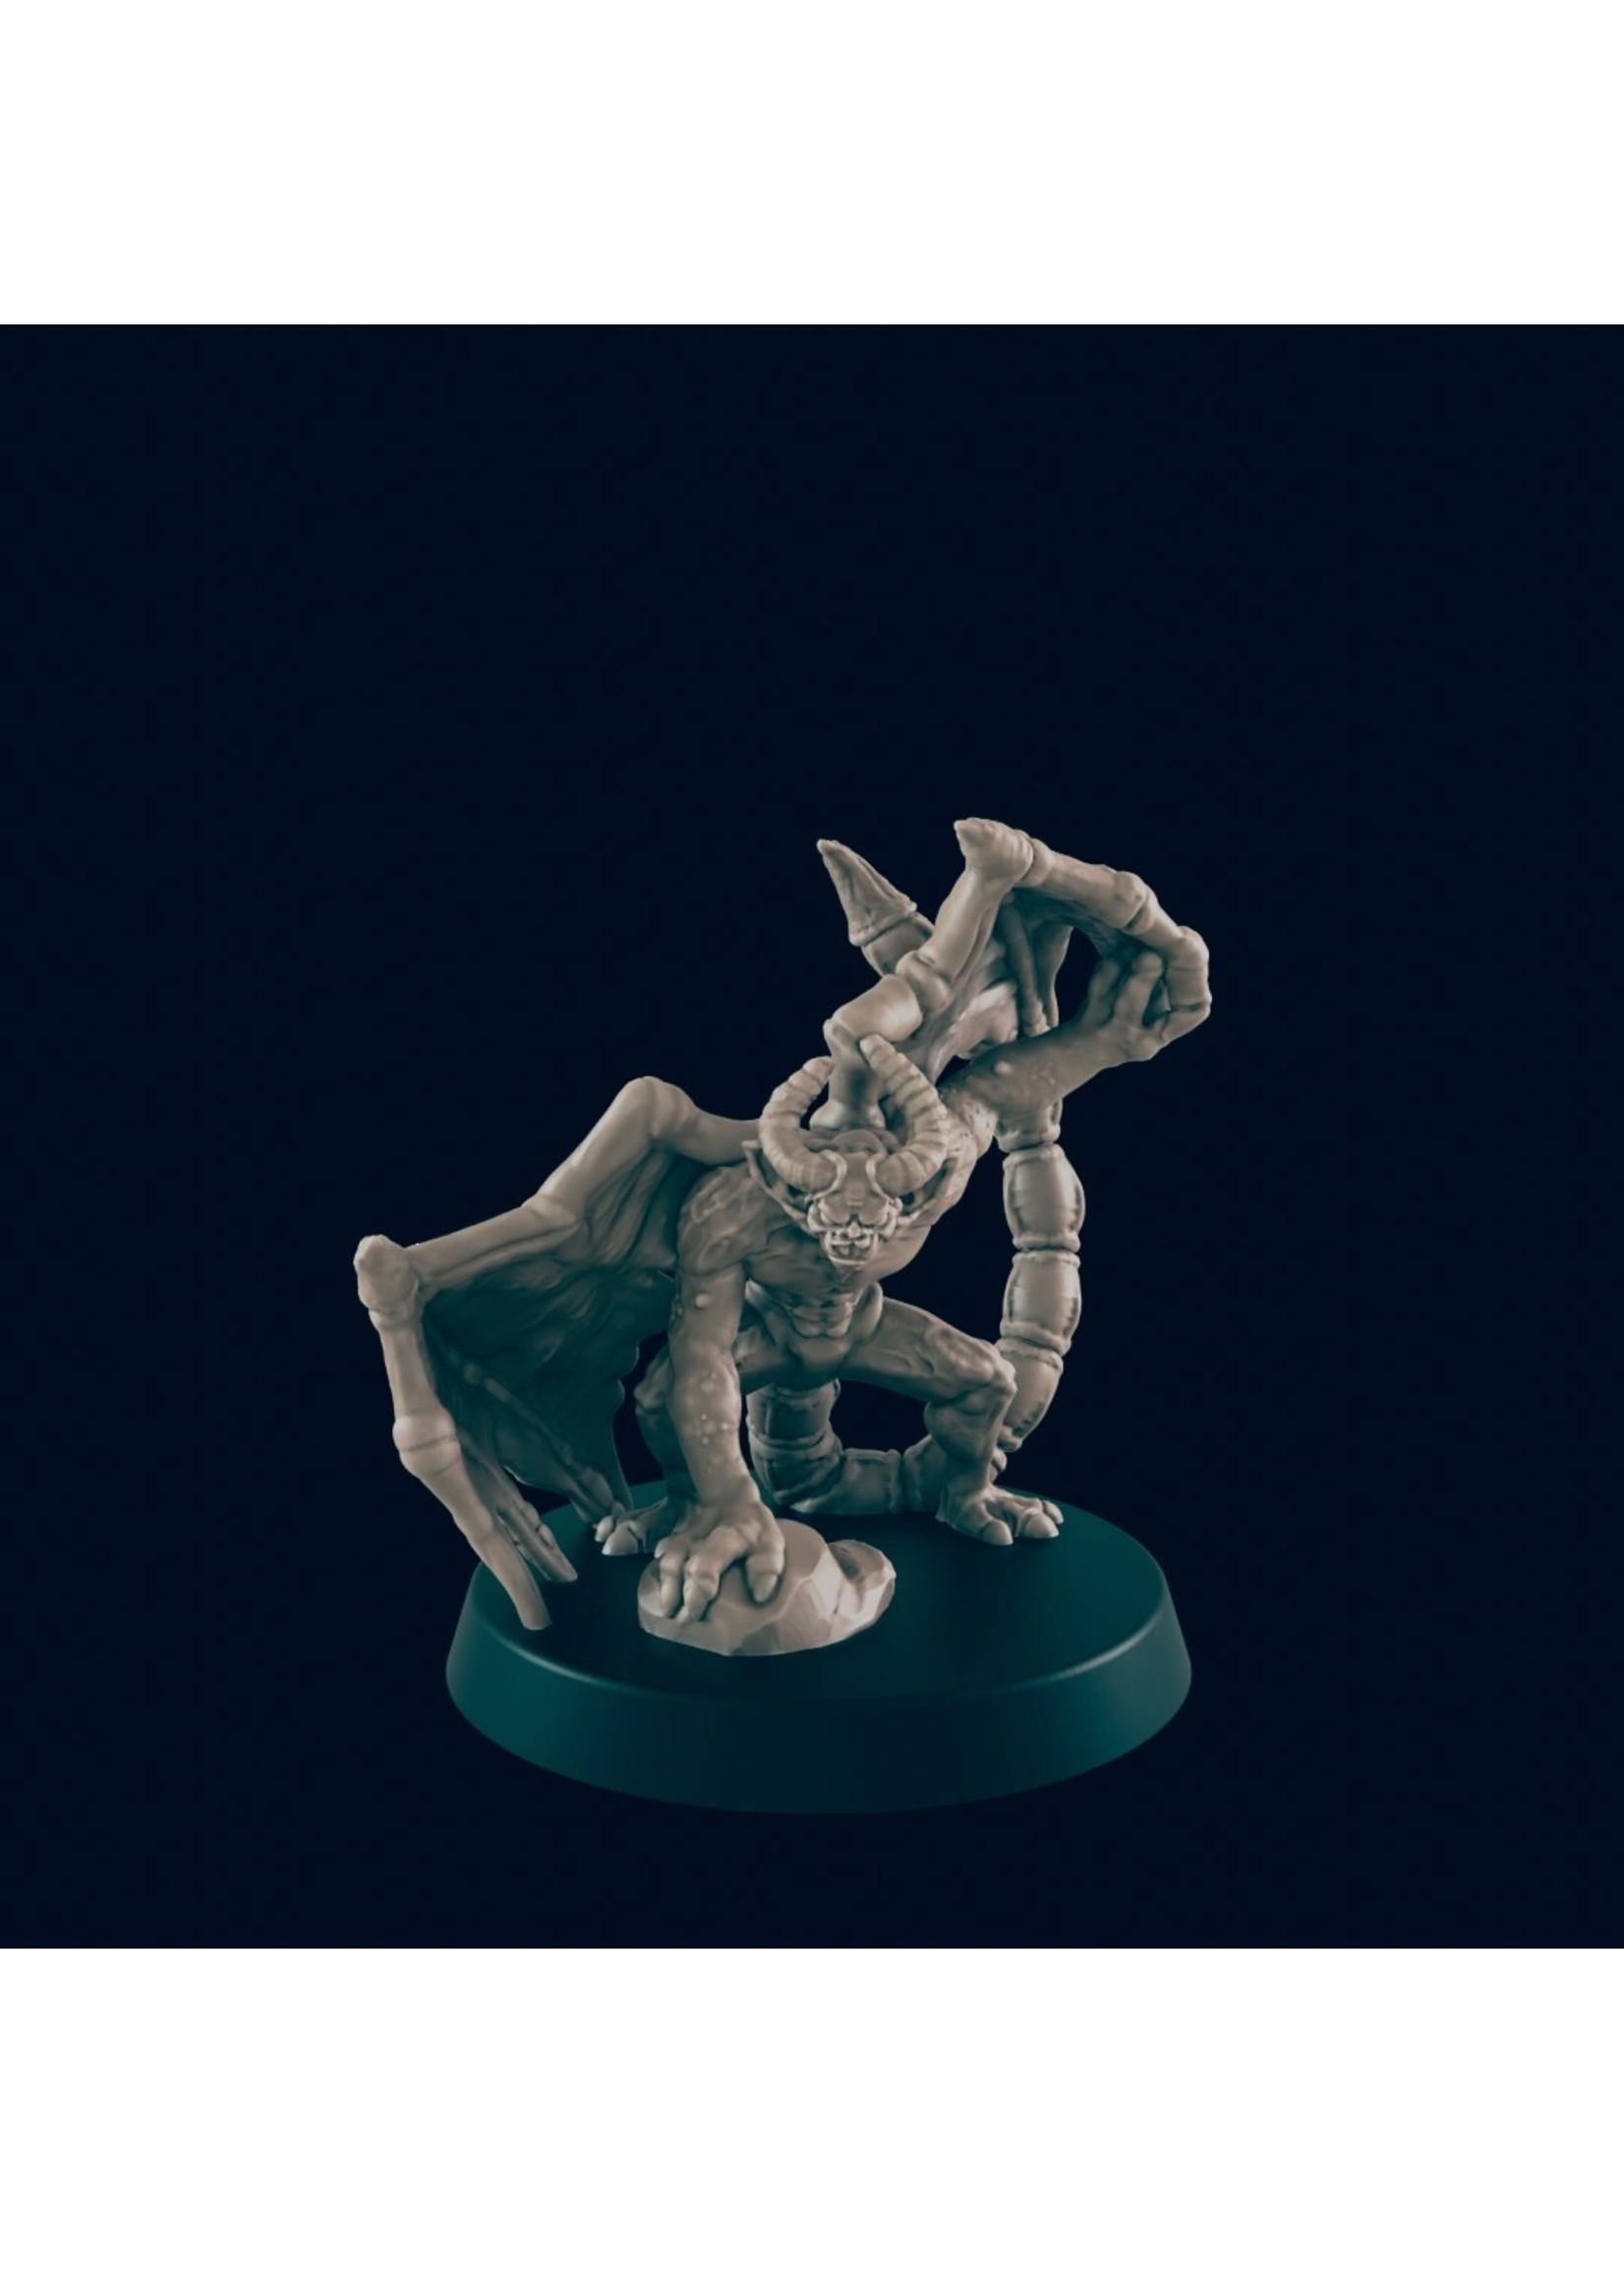 3D Printed Miniature - Imp 1 - Dungeons & Dragons - Beasts and Baddies KS